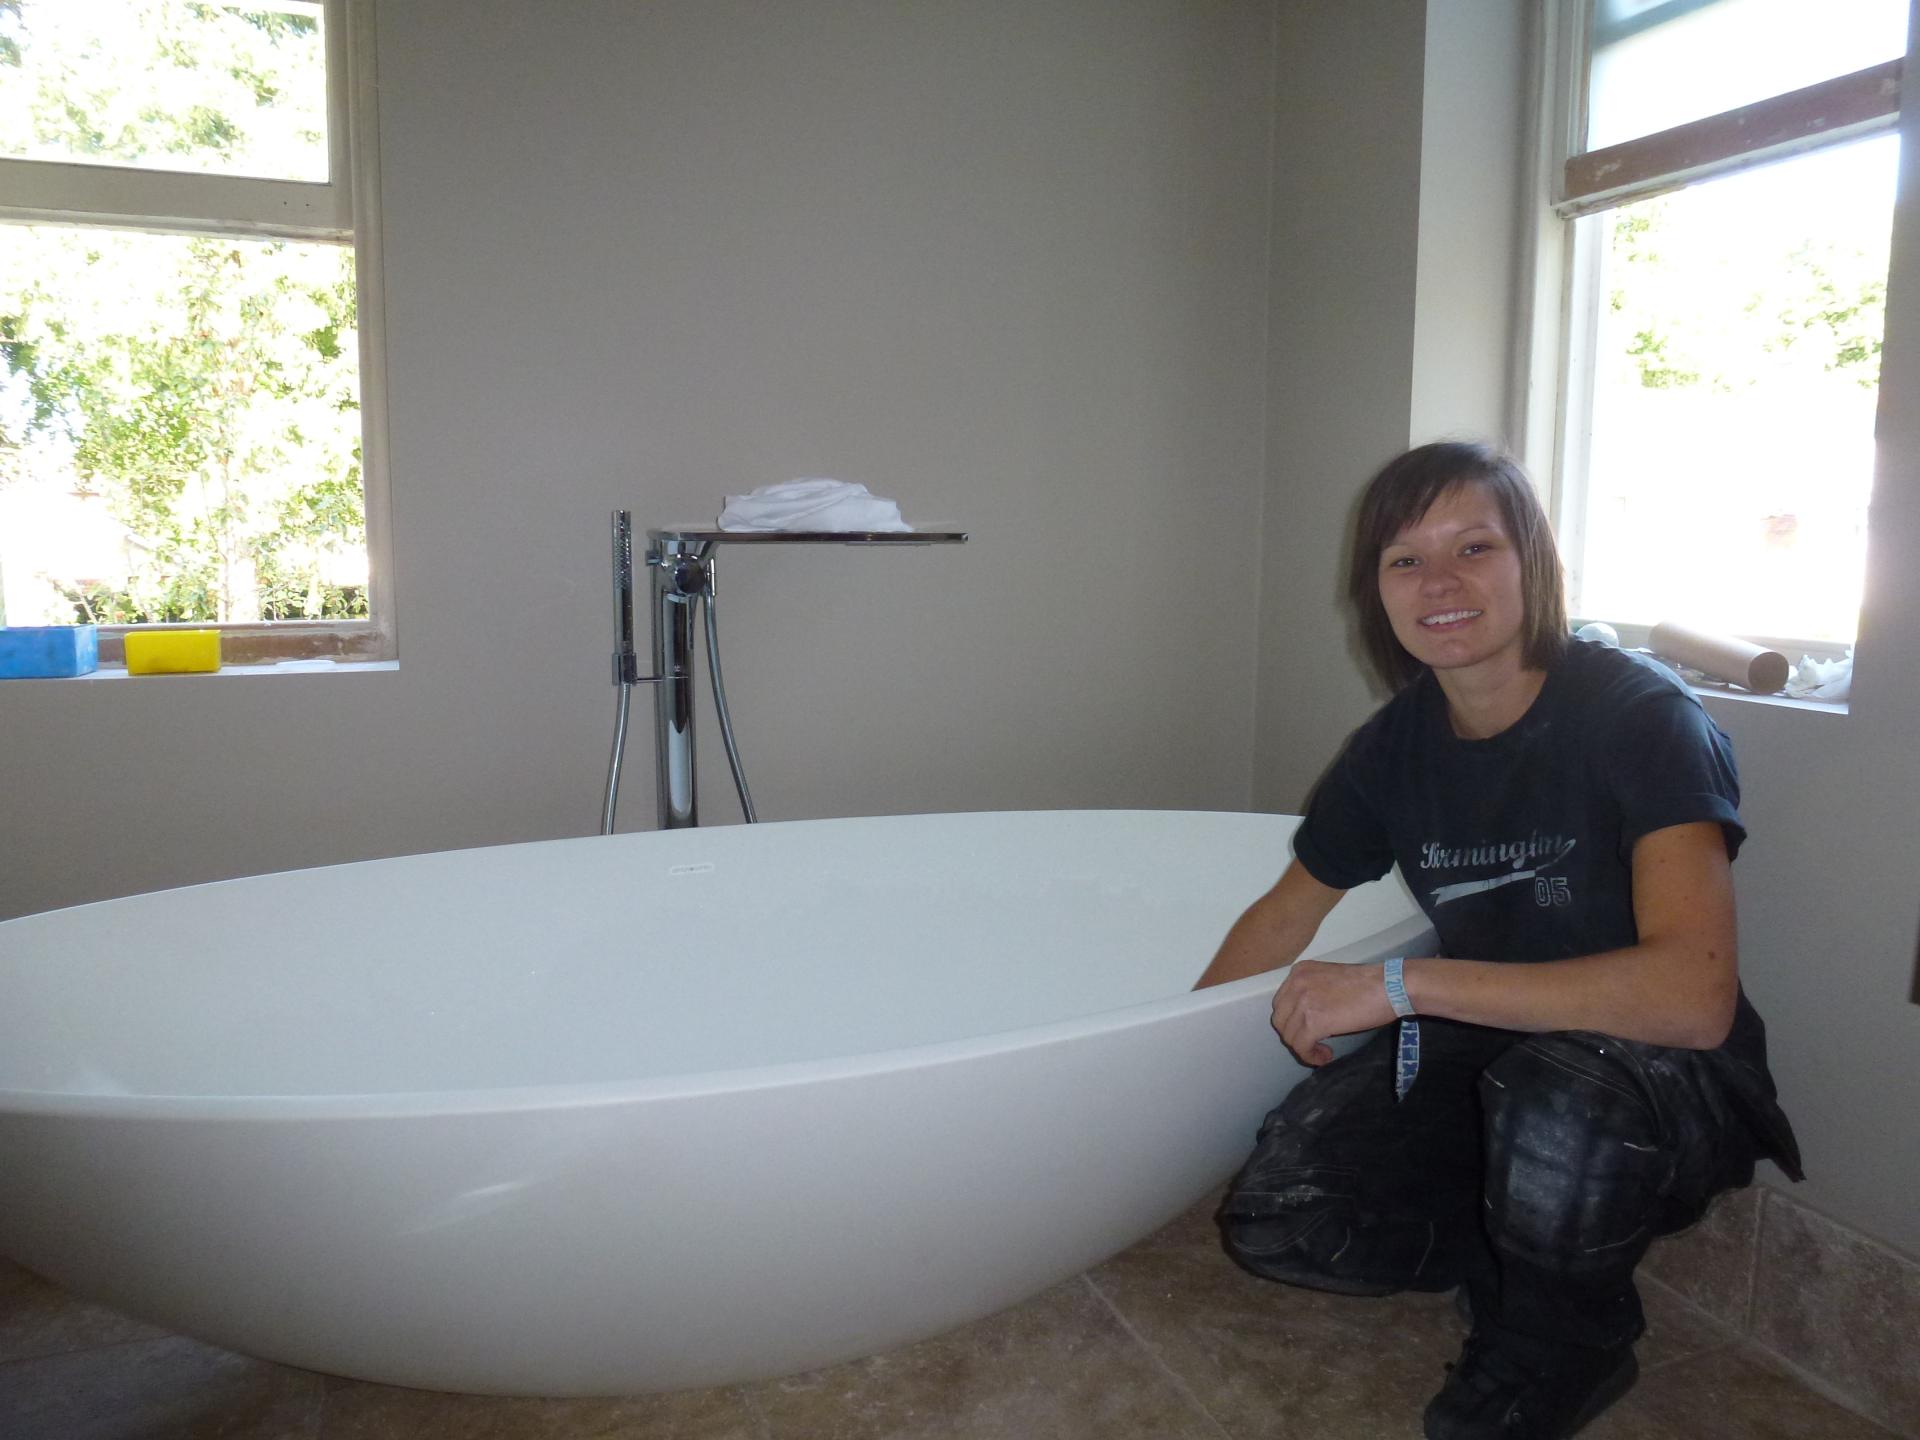 Teardrop bath